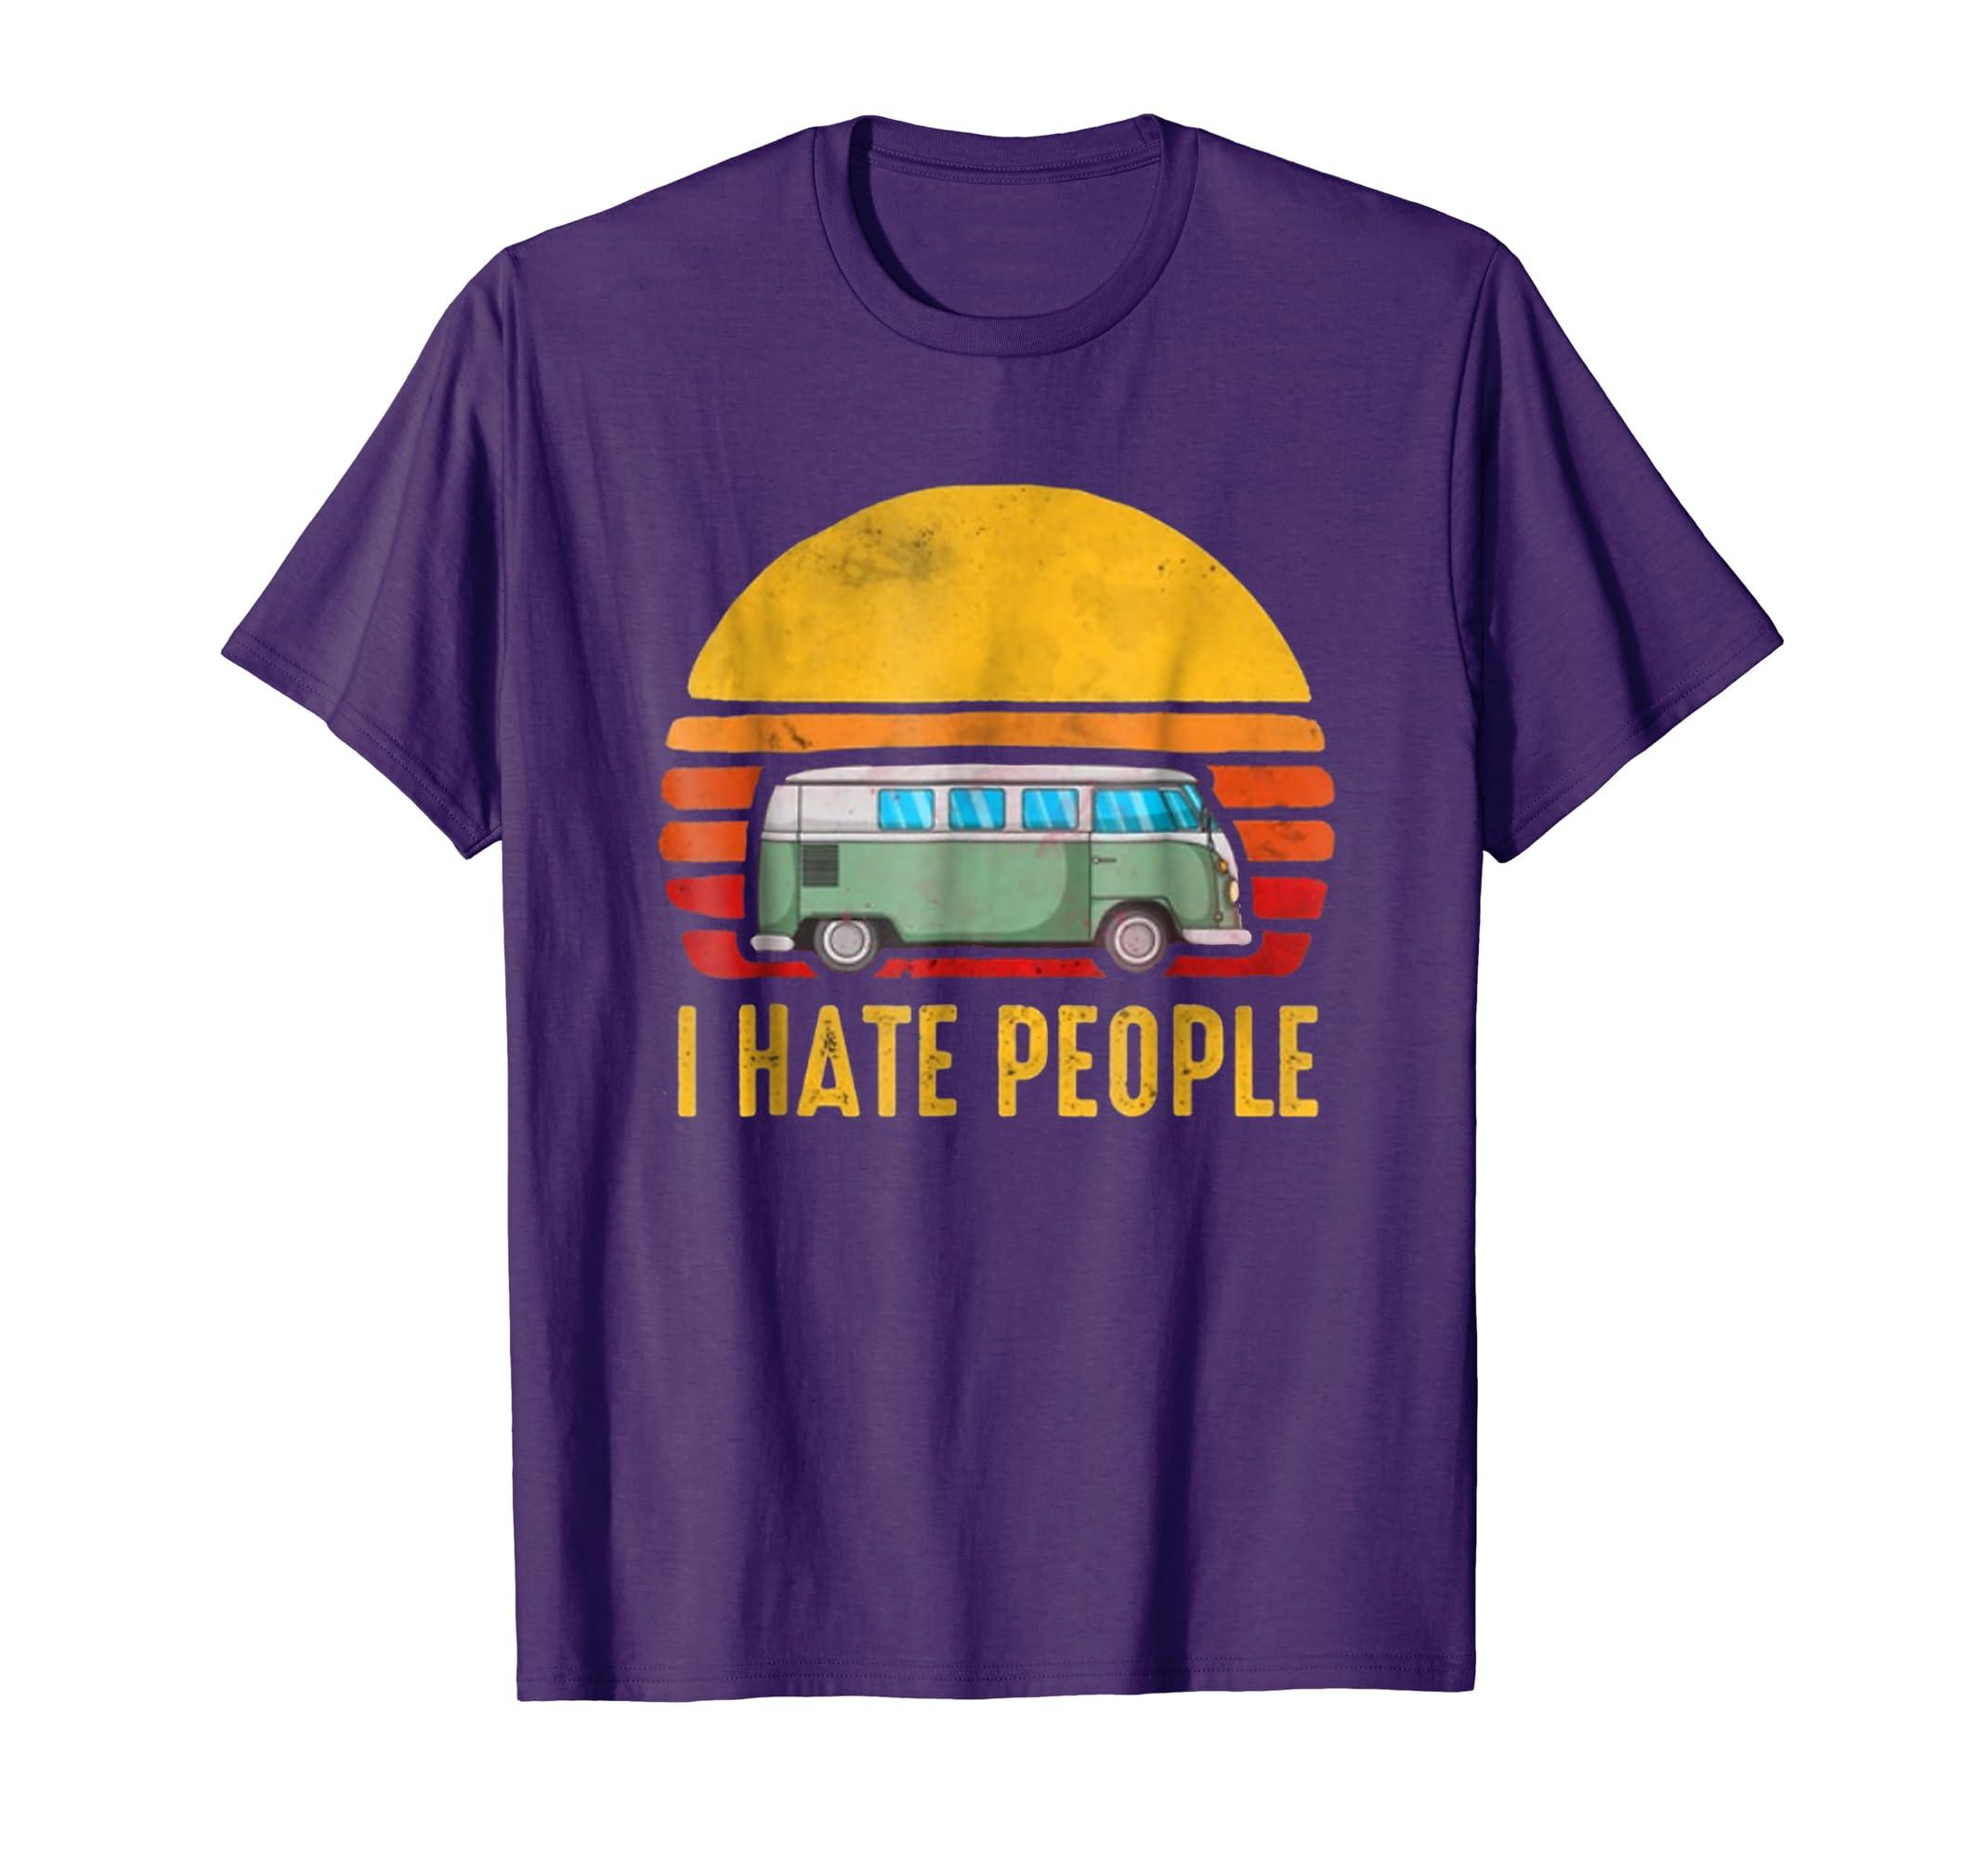 Funny Retro Vintage I Hate People T Shirt Gift for Women Men-4LVS